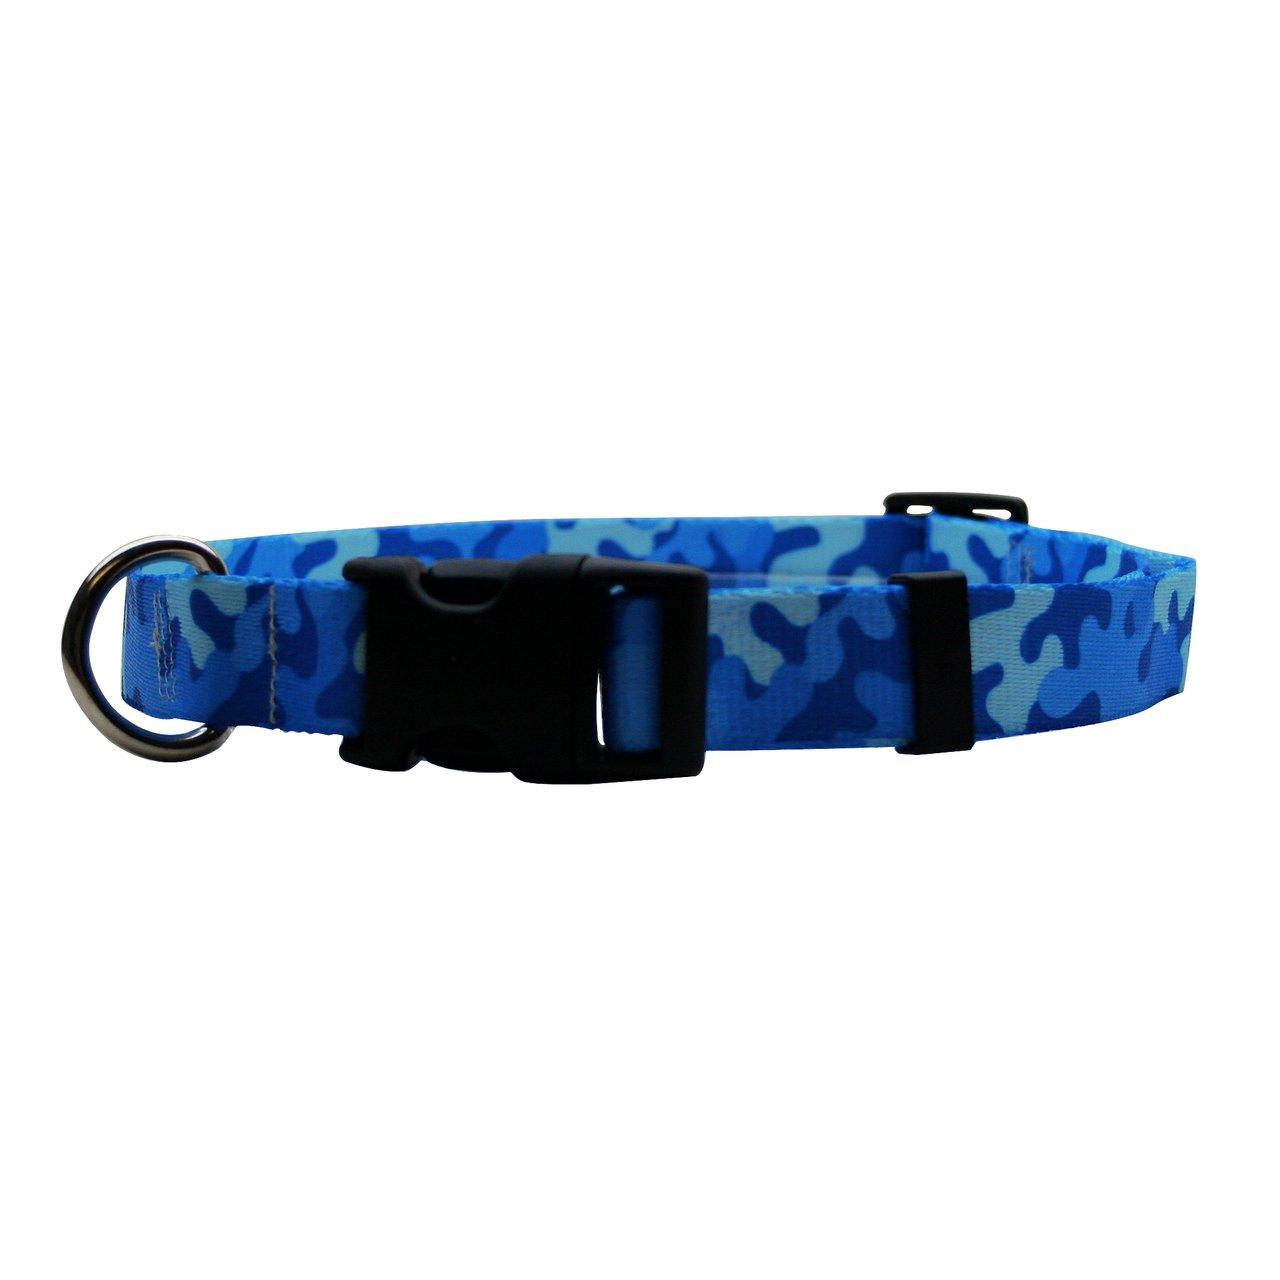 Camo bluee Medium 14\ Camo bluee Medium 14\ Yellow Dog Design Camo bluee Dog Collar Fits Neck 14 to 20 , Medium 1  Wide